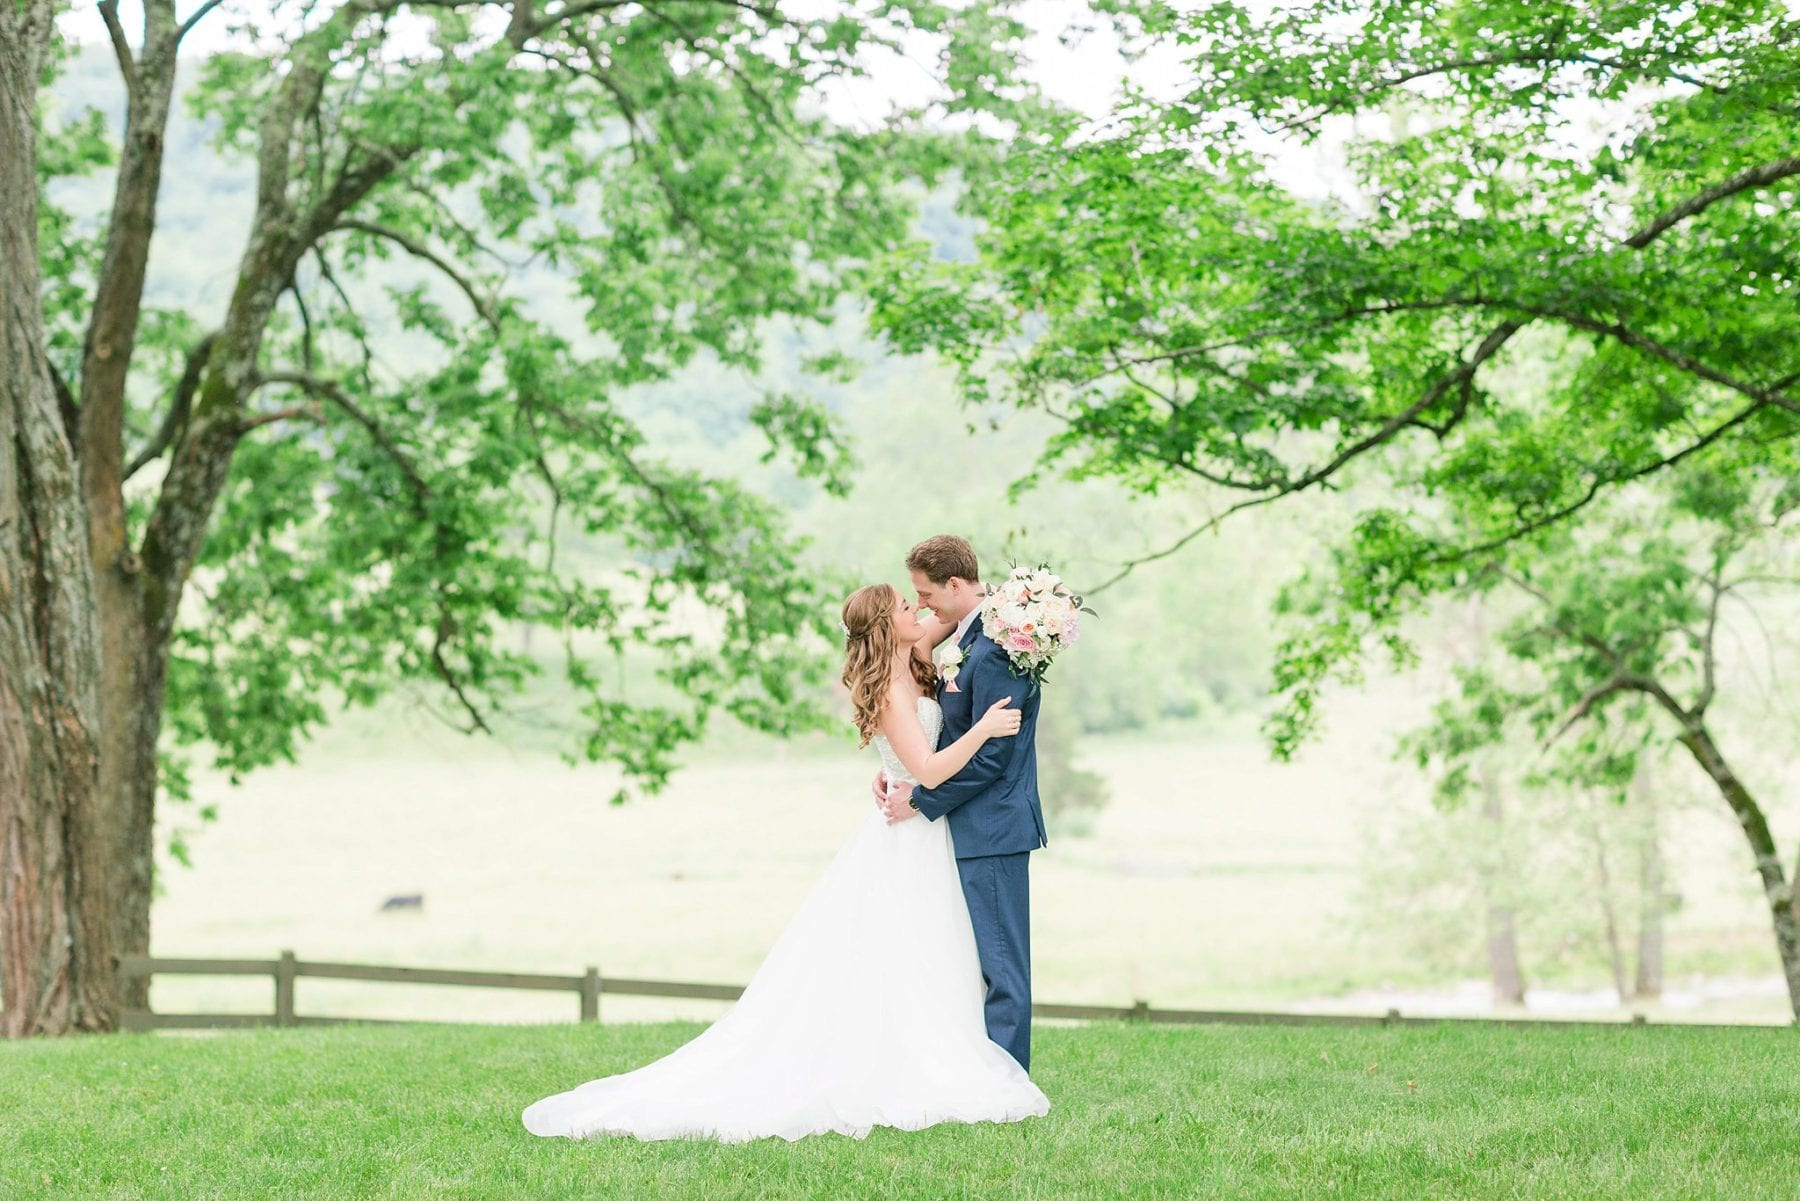 Justin & Megan Big Spring Farm Wedding Photos-172.jpg